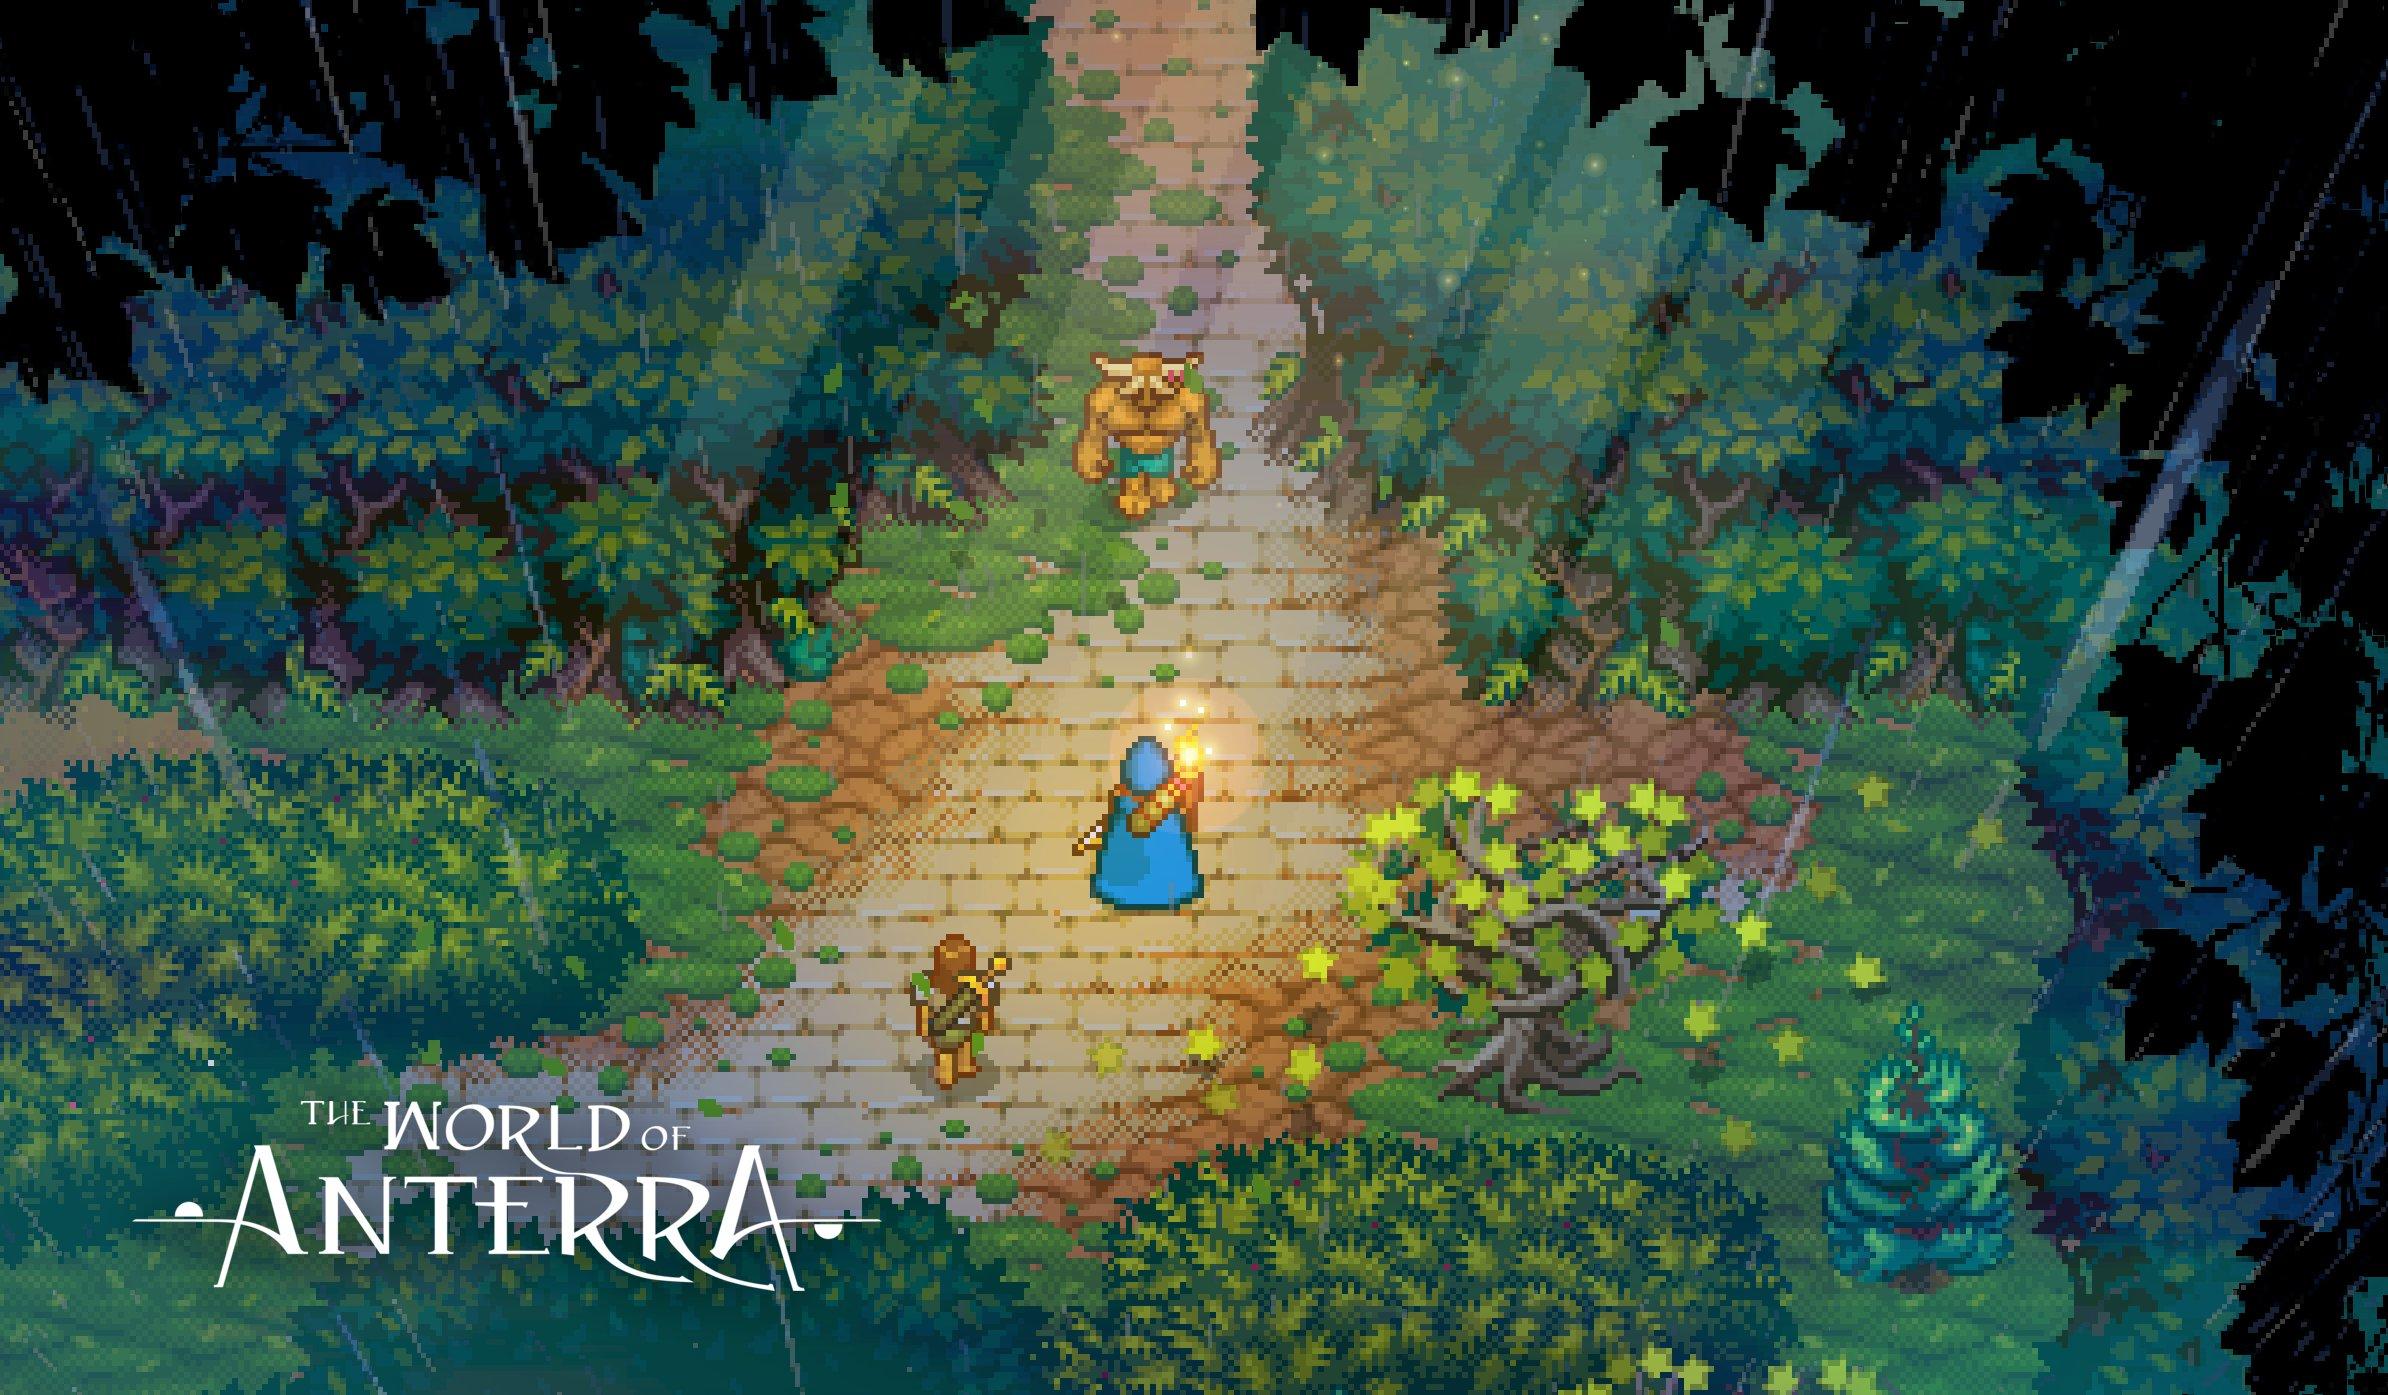 The World of Anterra